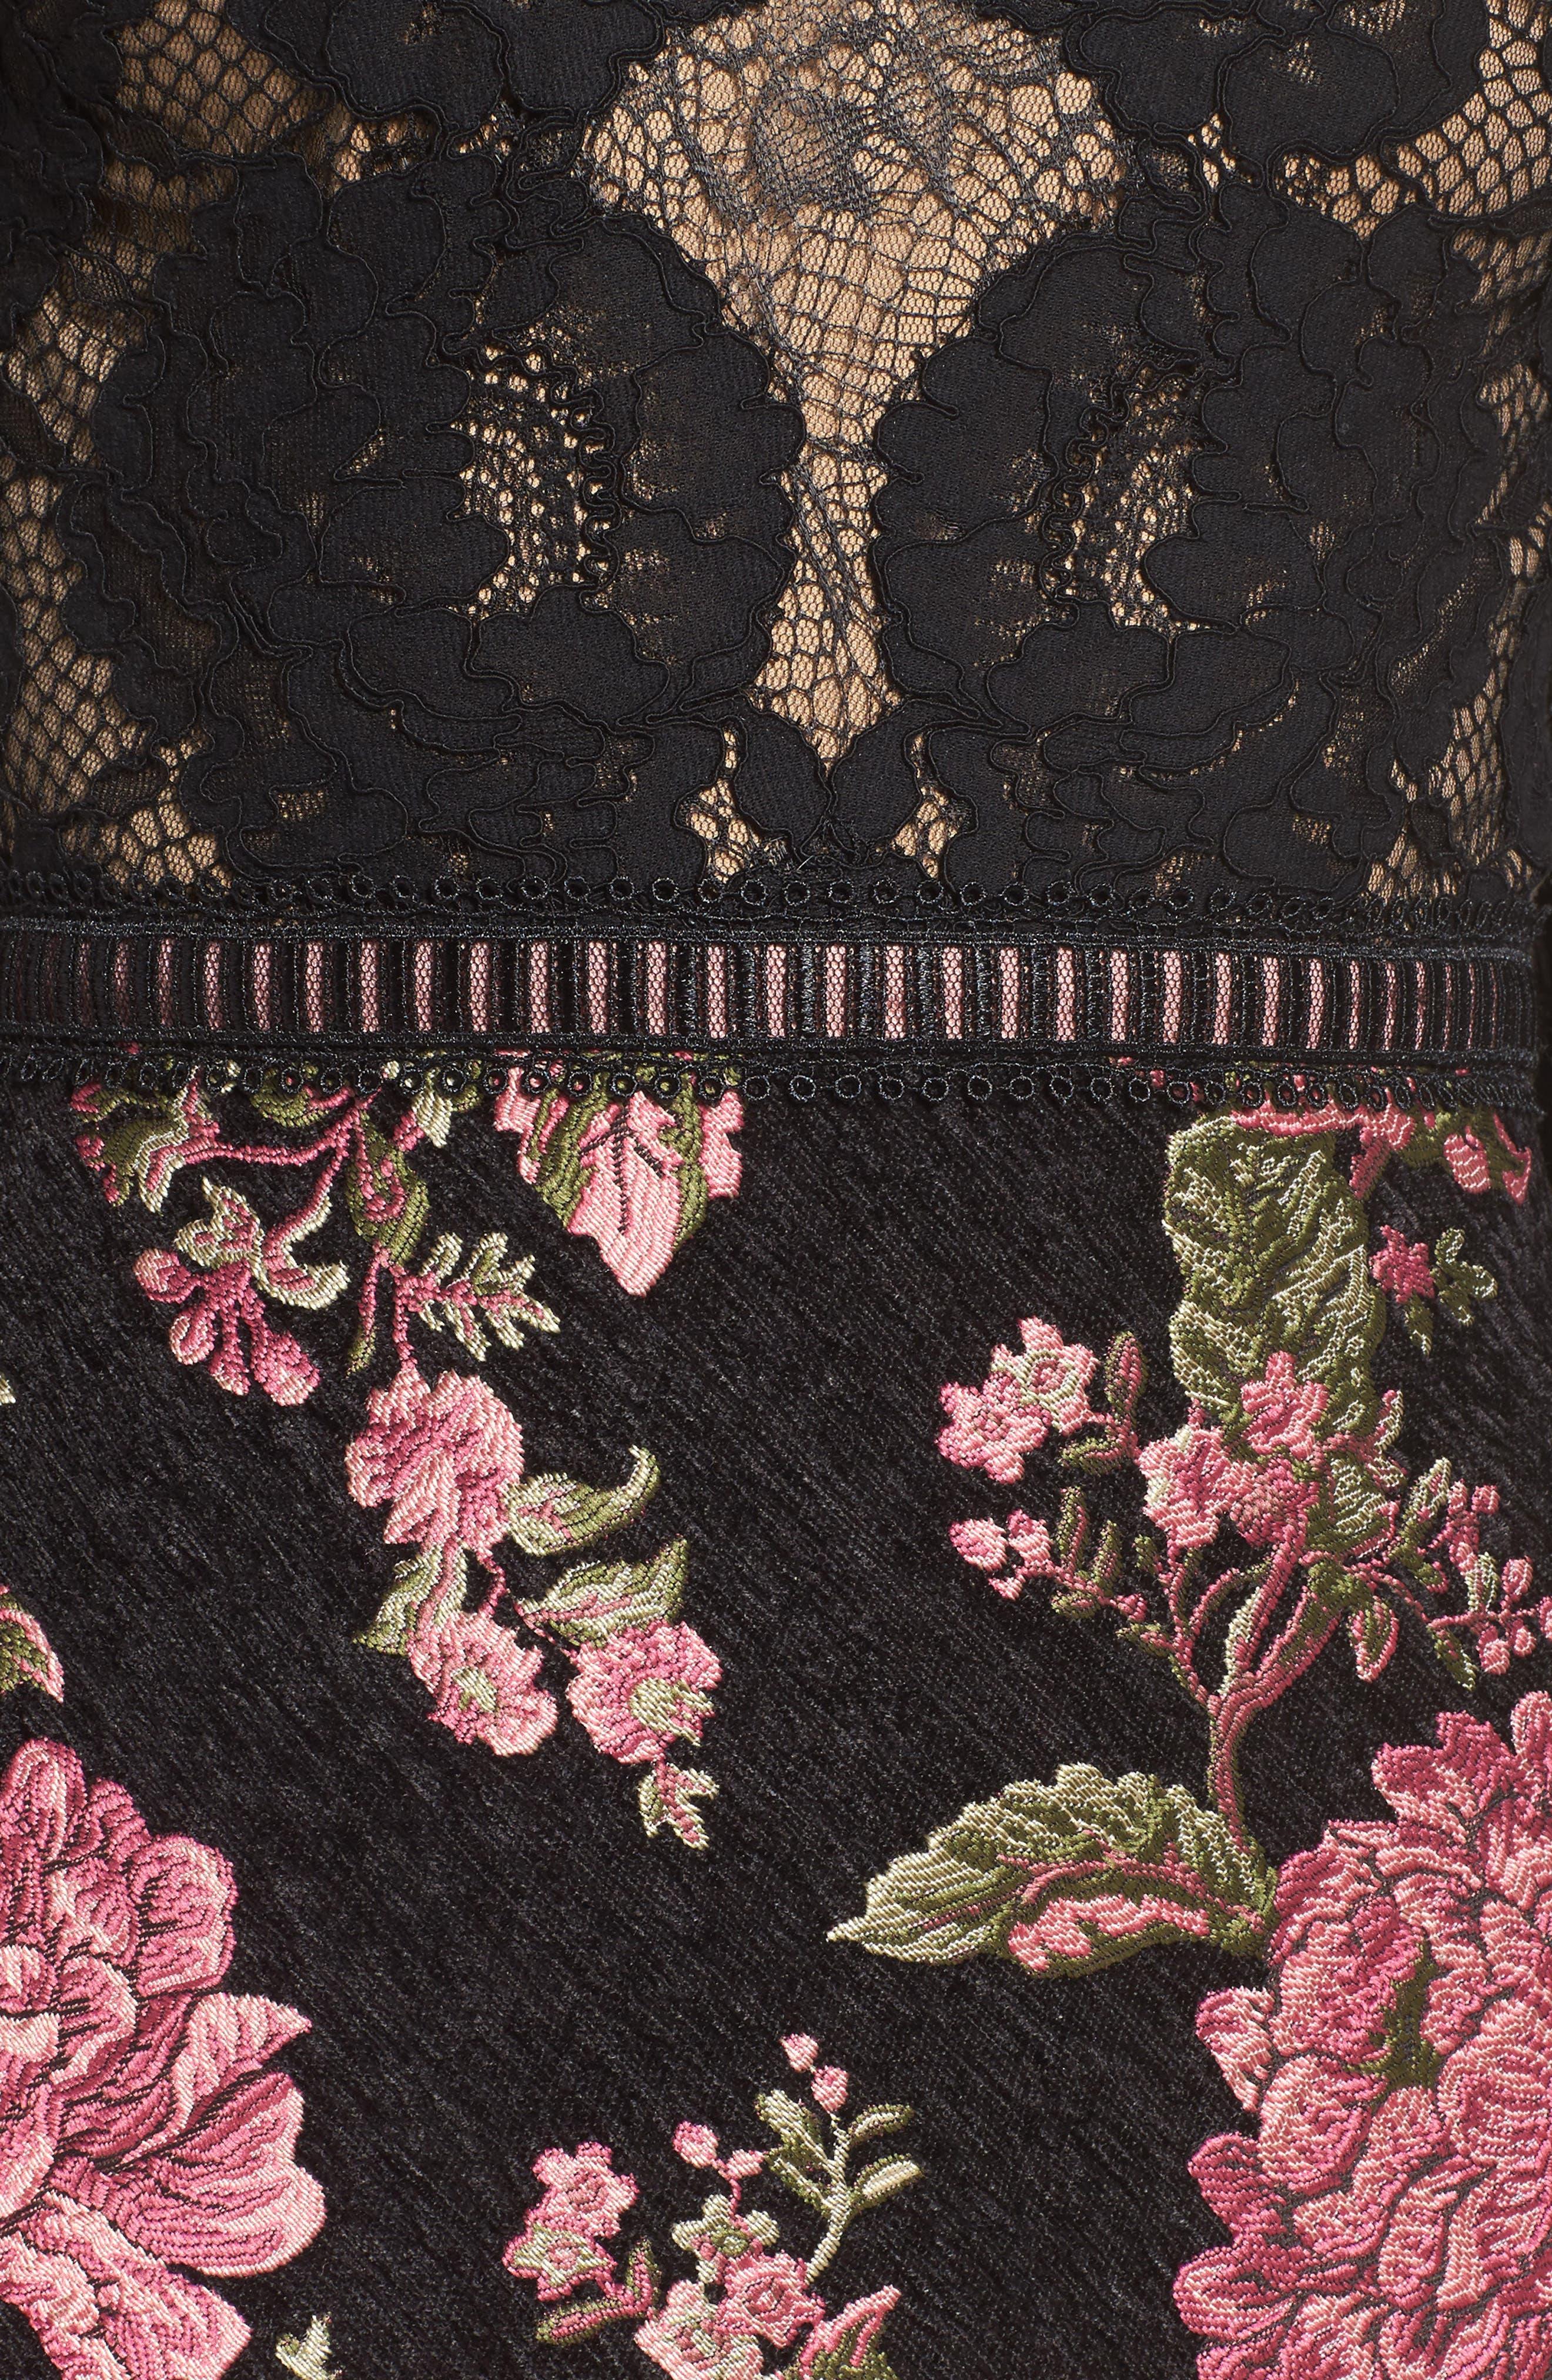 Lace & Brocade Sheath Dress,                             Alternate thumbnail 5, color,                             Black